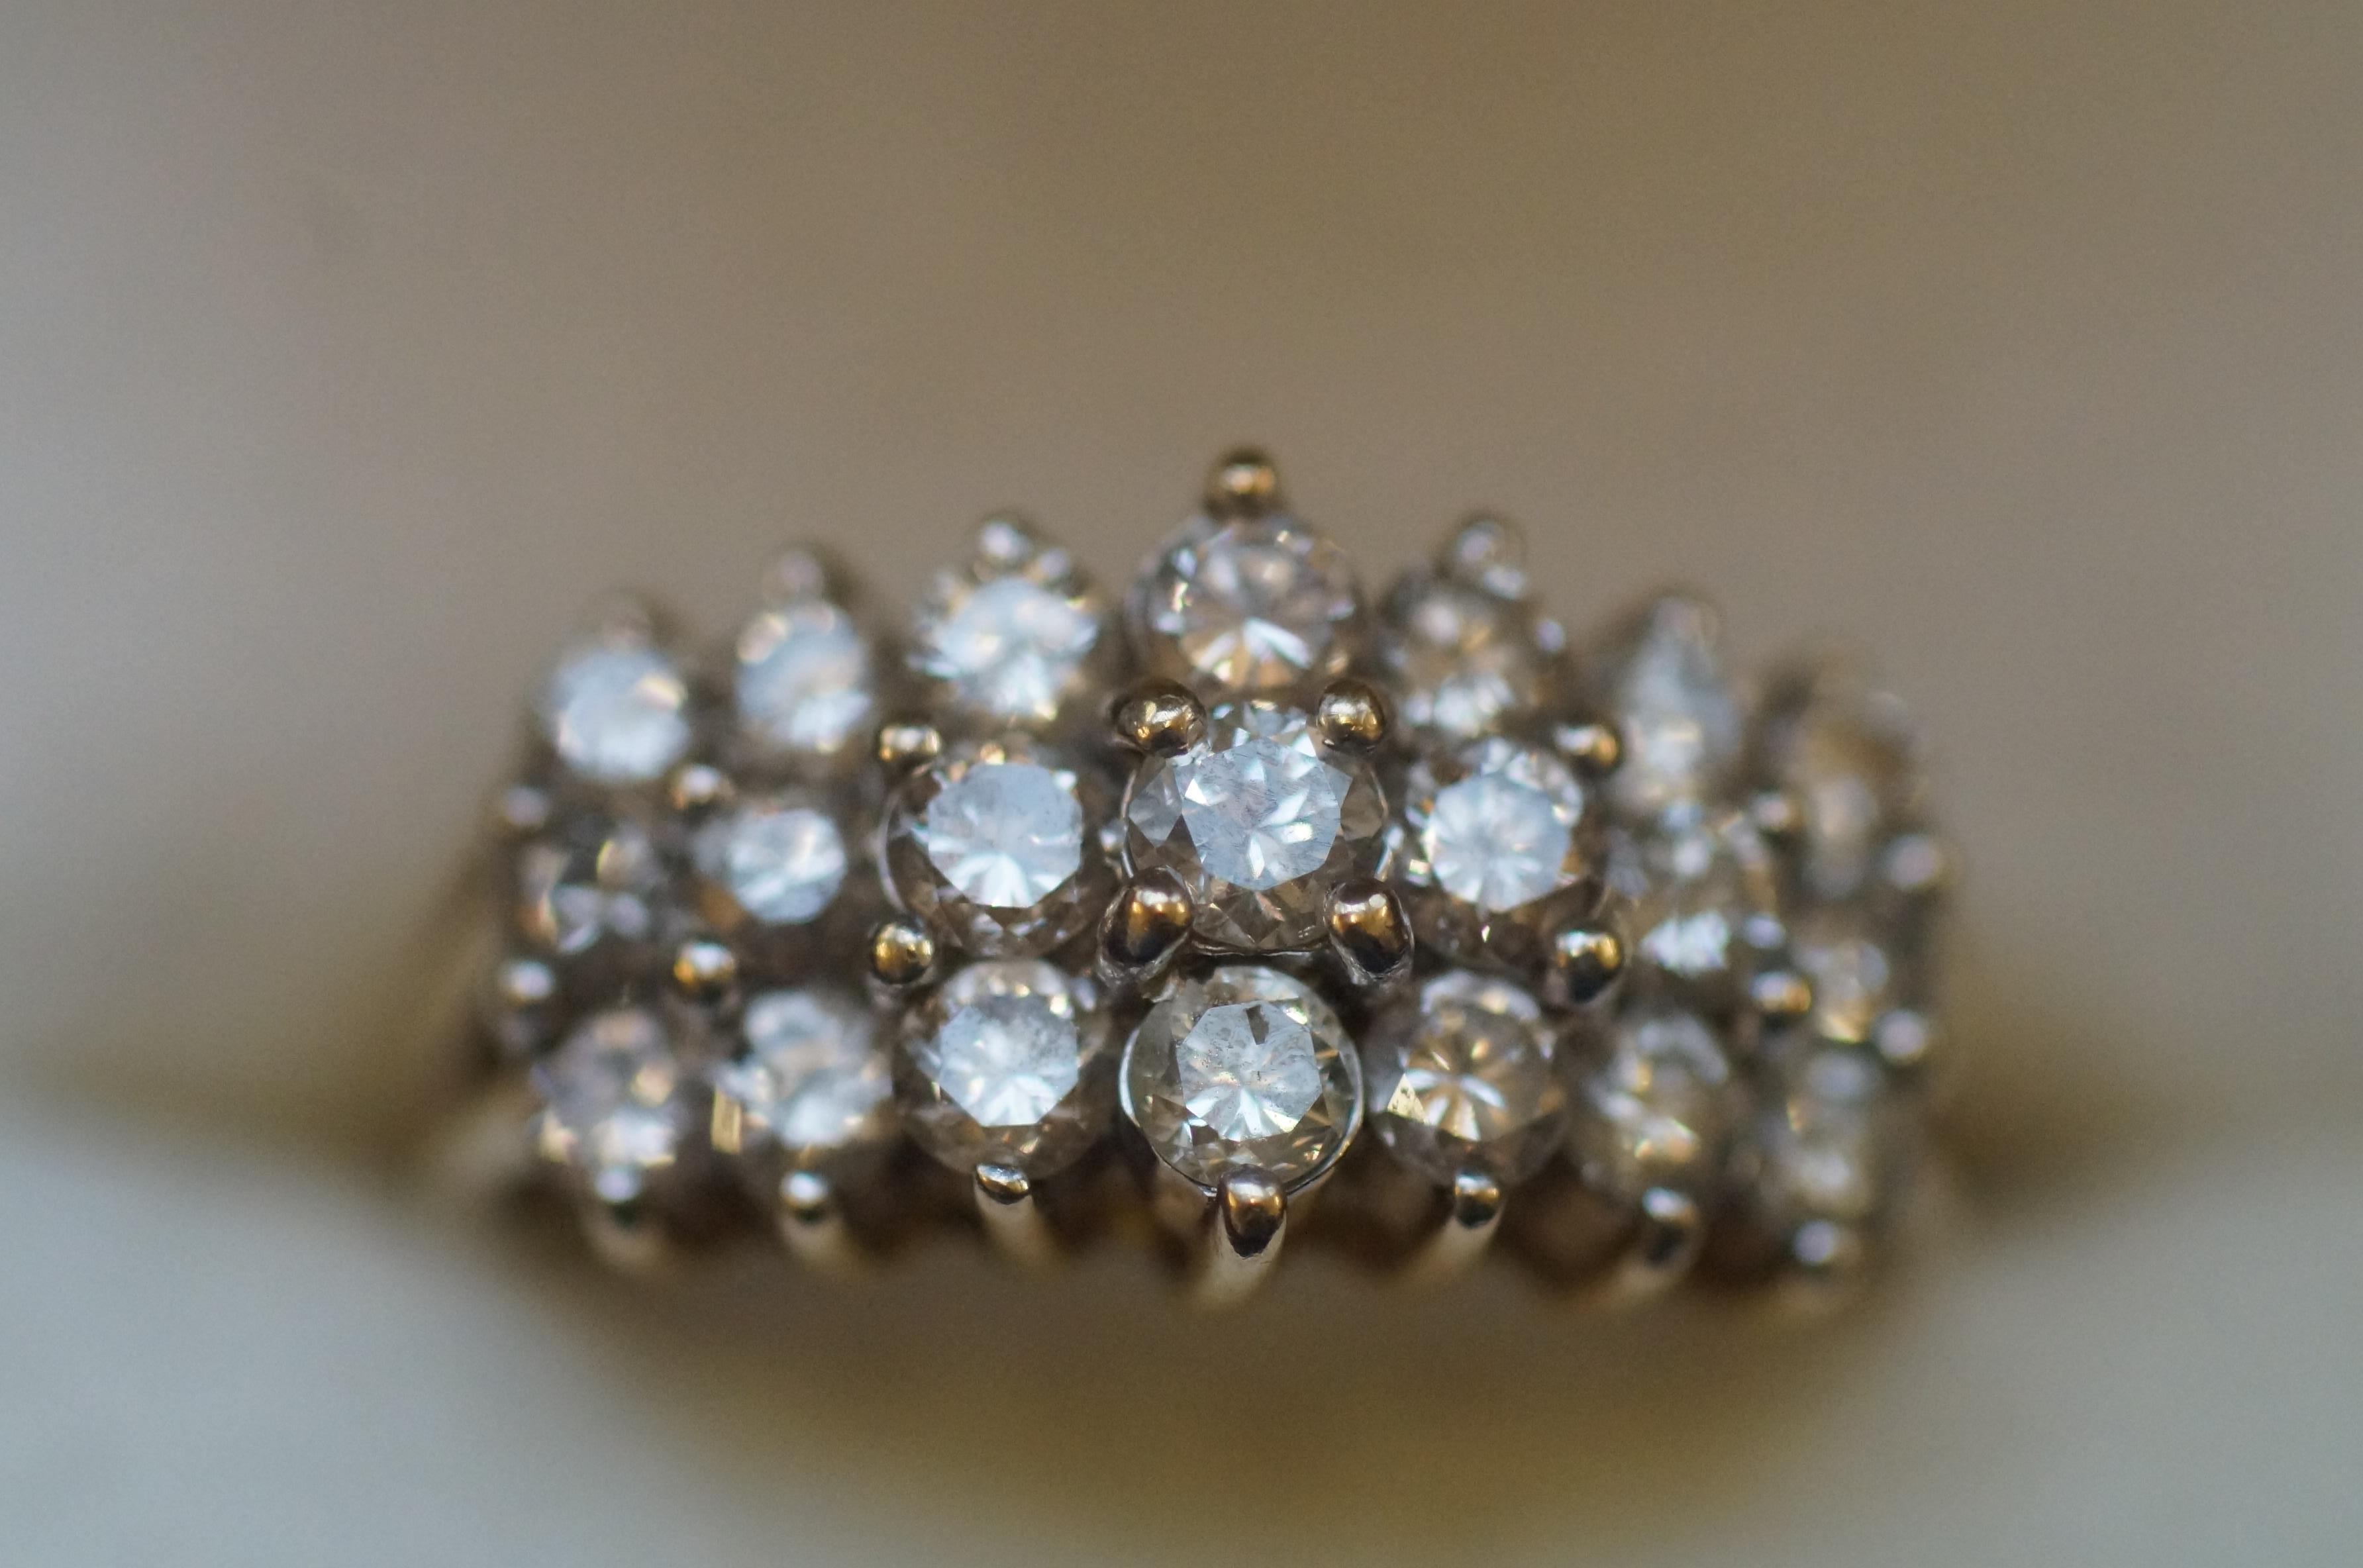 9ct Gold diamond ring, 1.5 carat (21 diamonds)